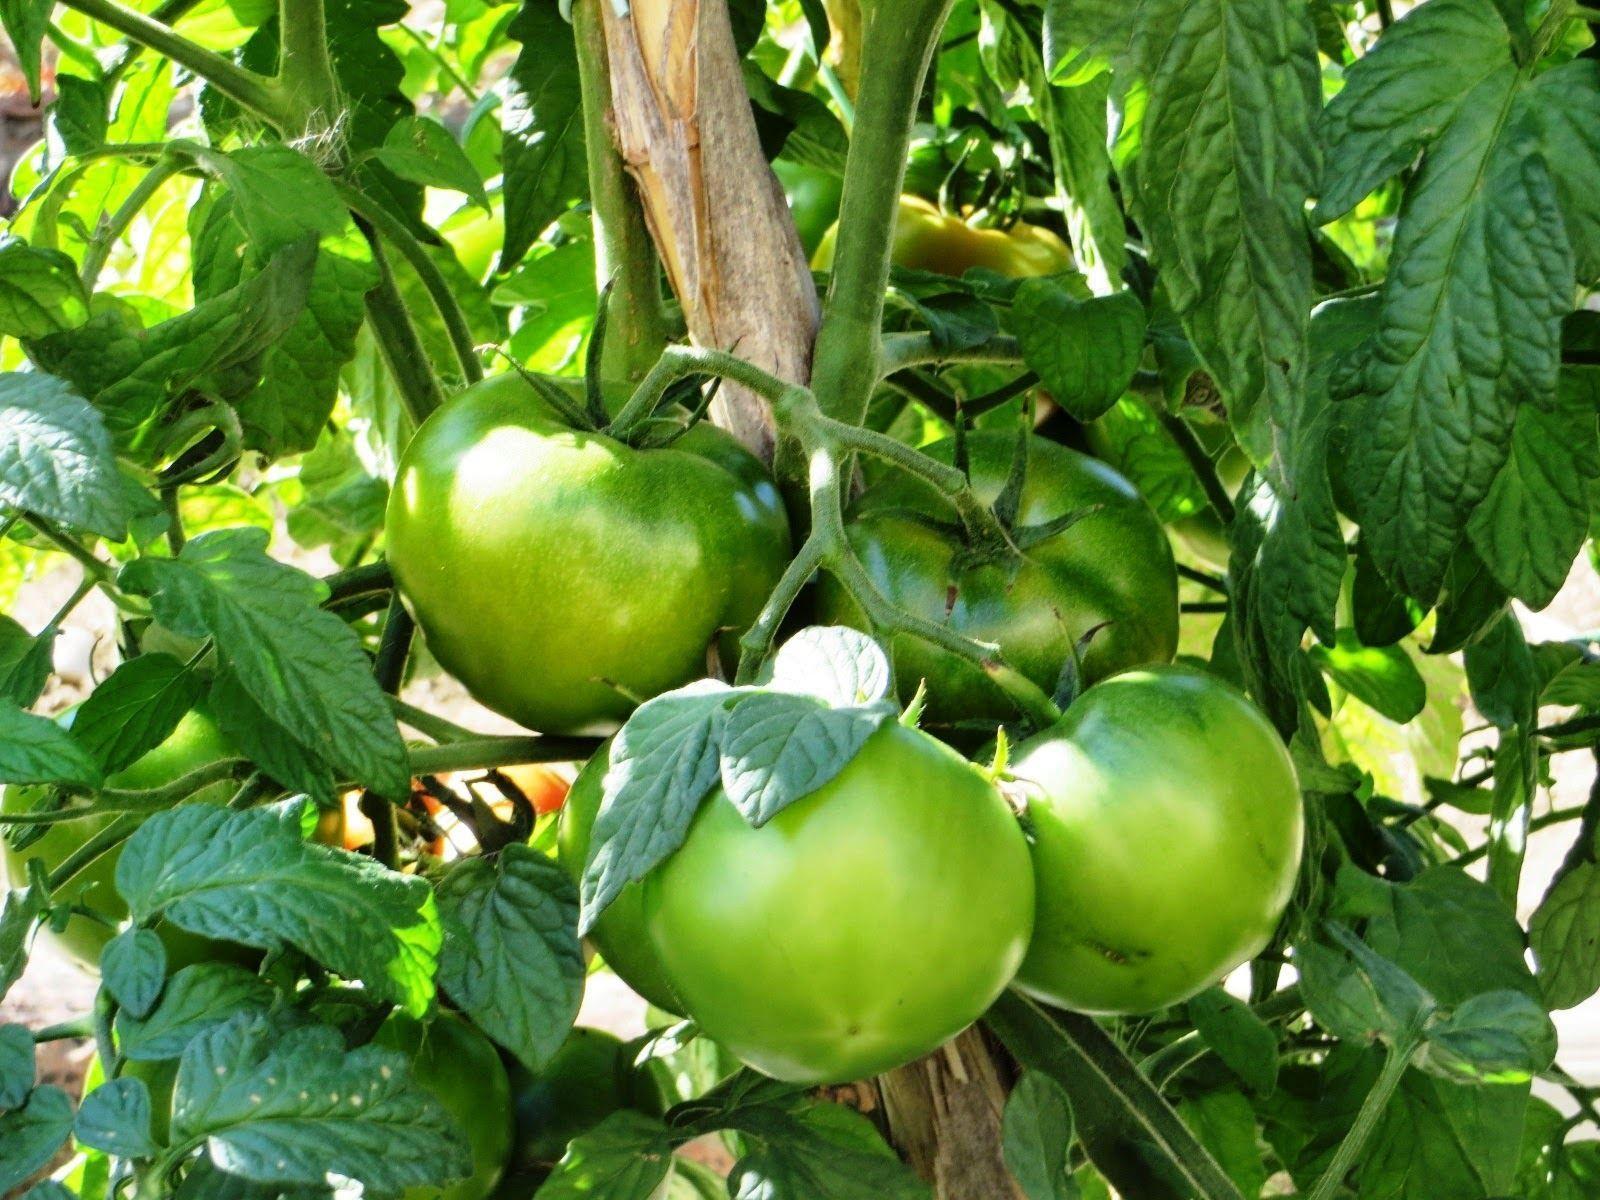 Como plantar tomates para principiantes - Ecocosas